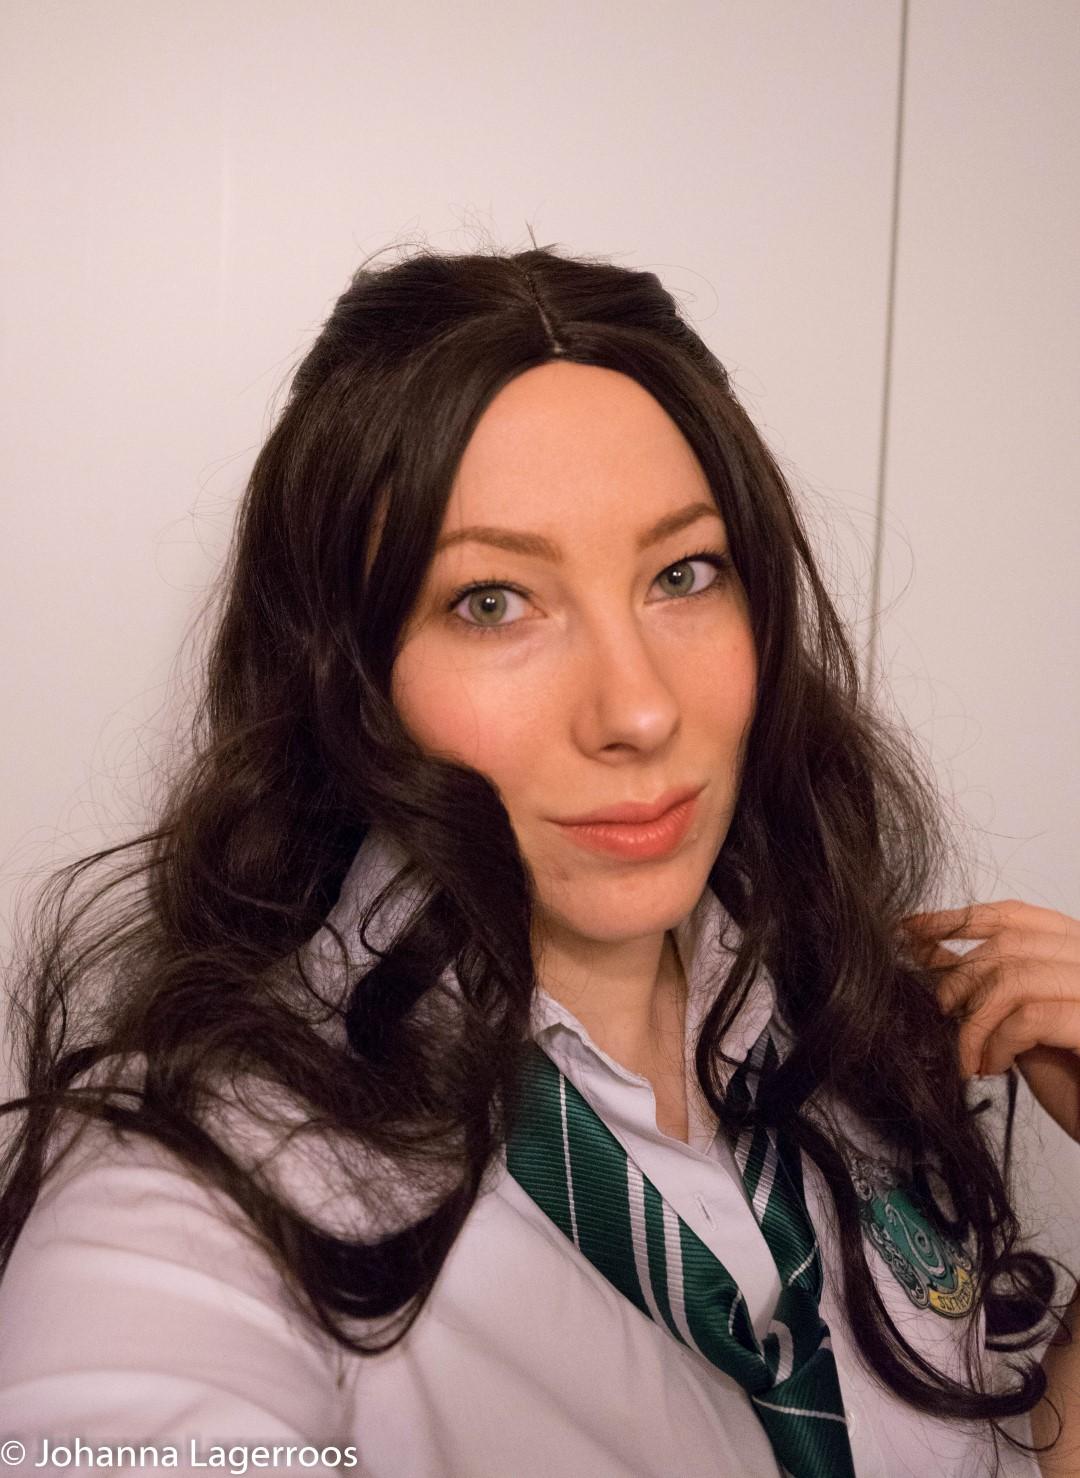 Hogwarts student look